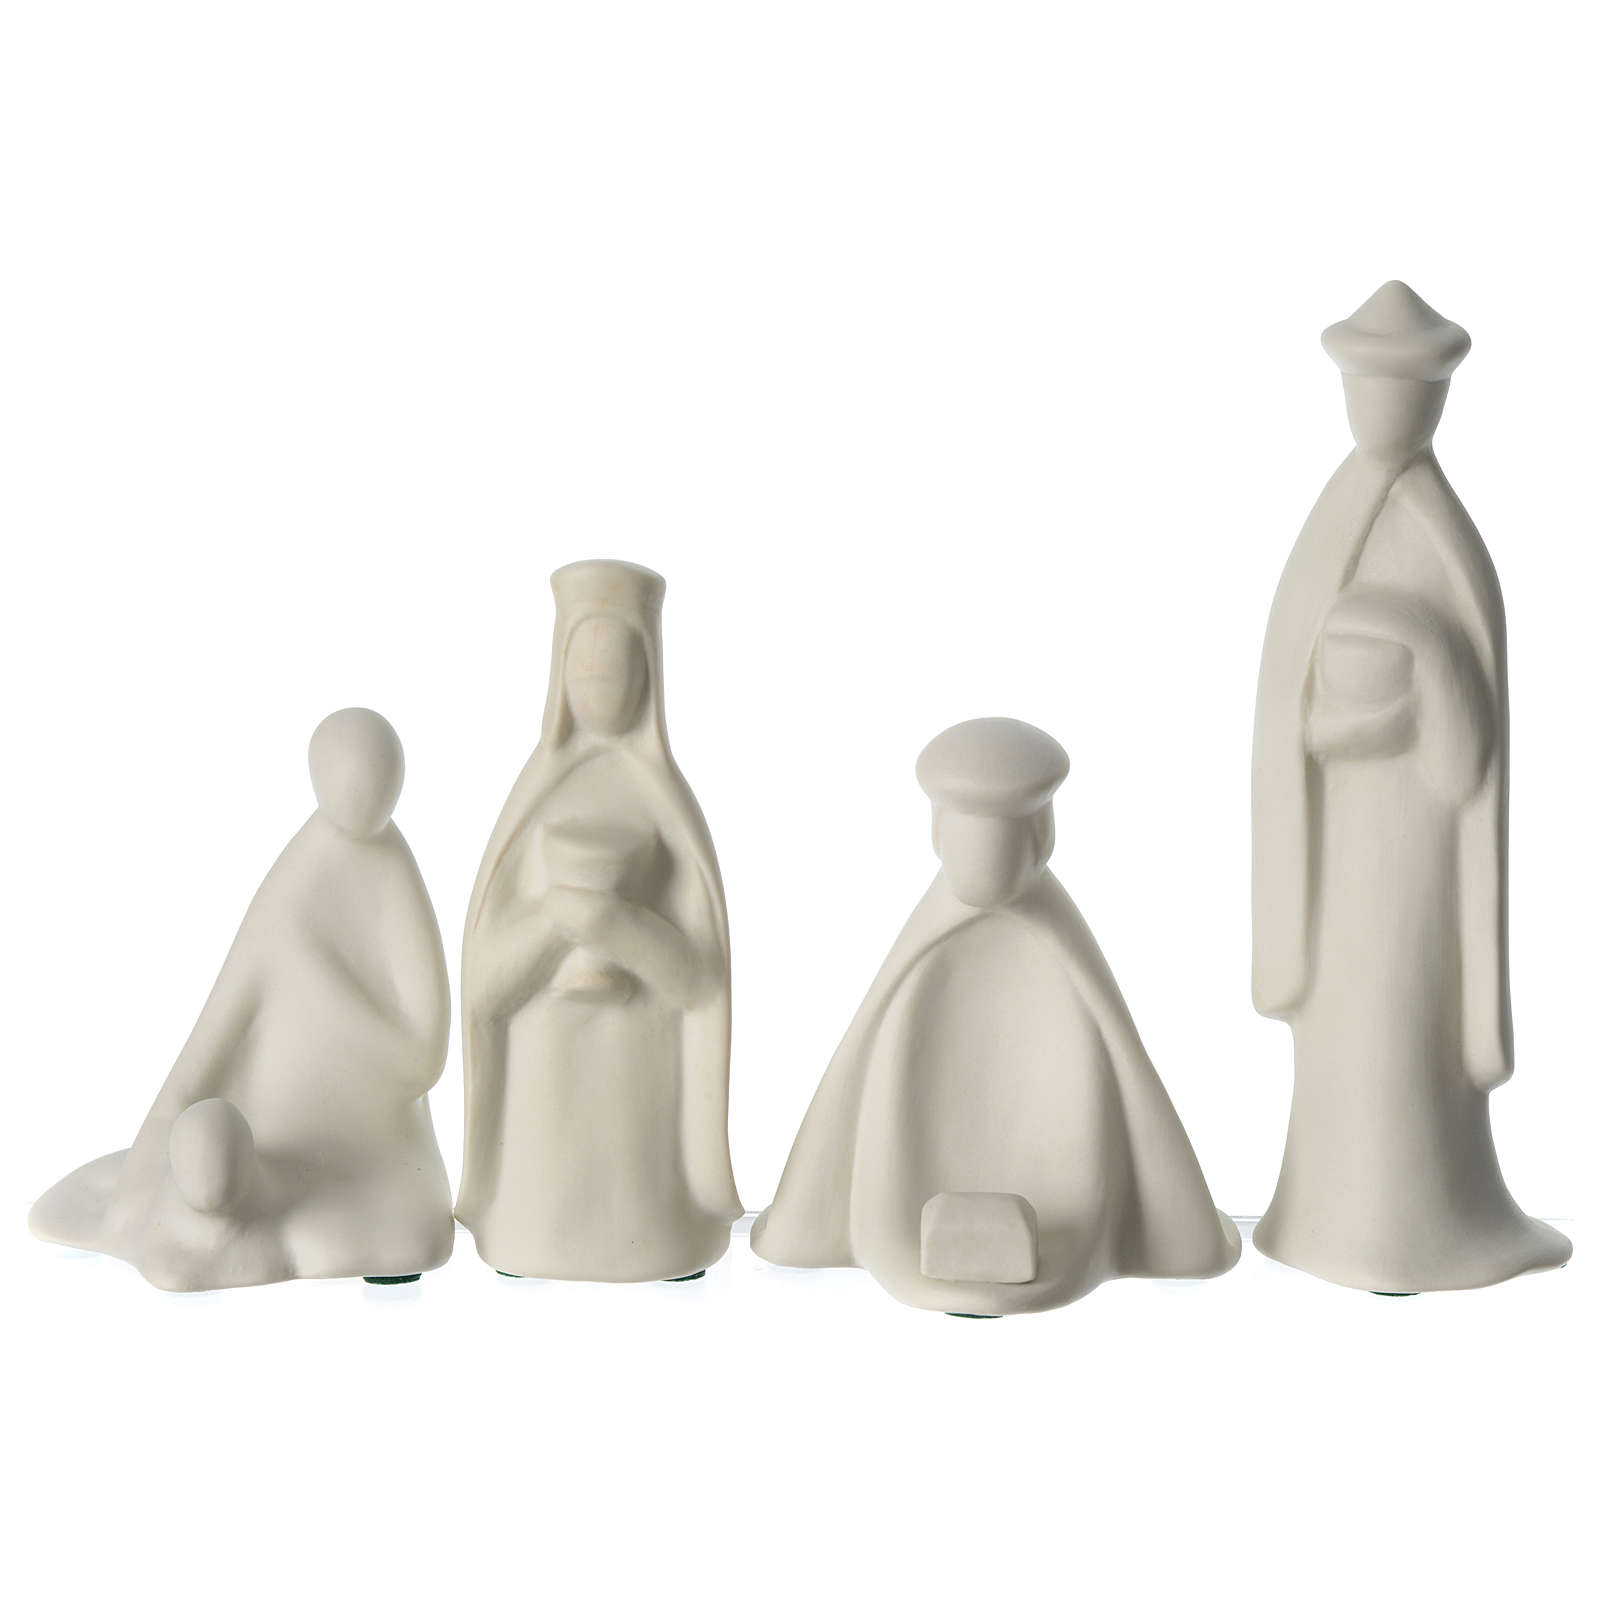 Tres reyes y pastor porcelana para belén 16 cm de altura media Francesco Pinton 4